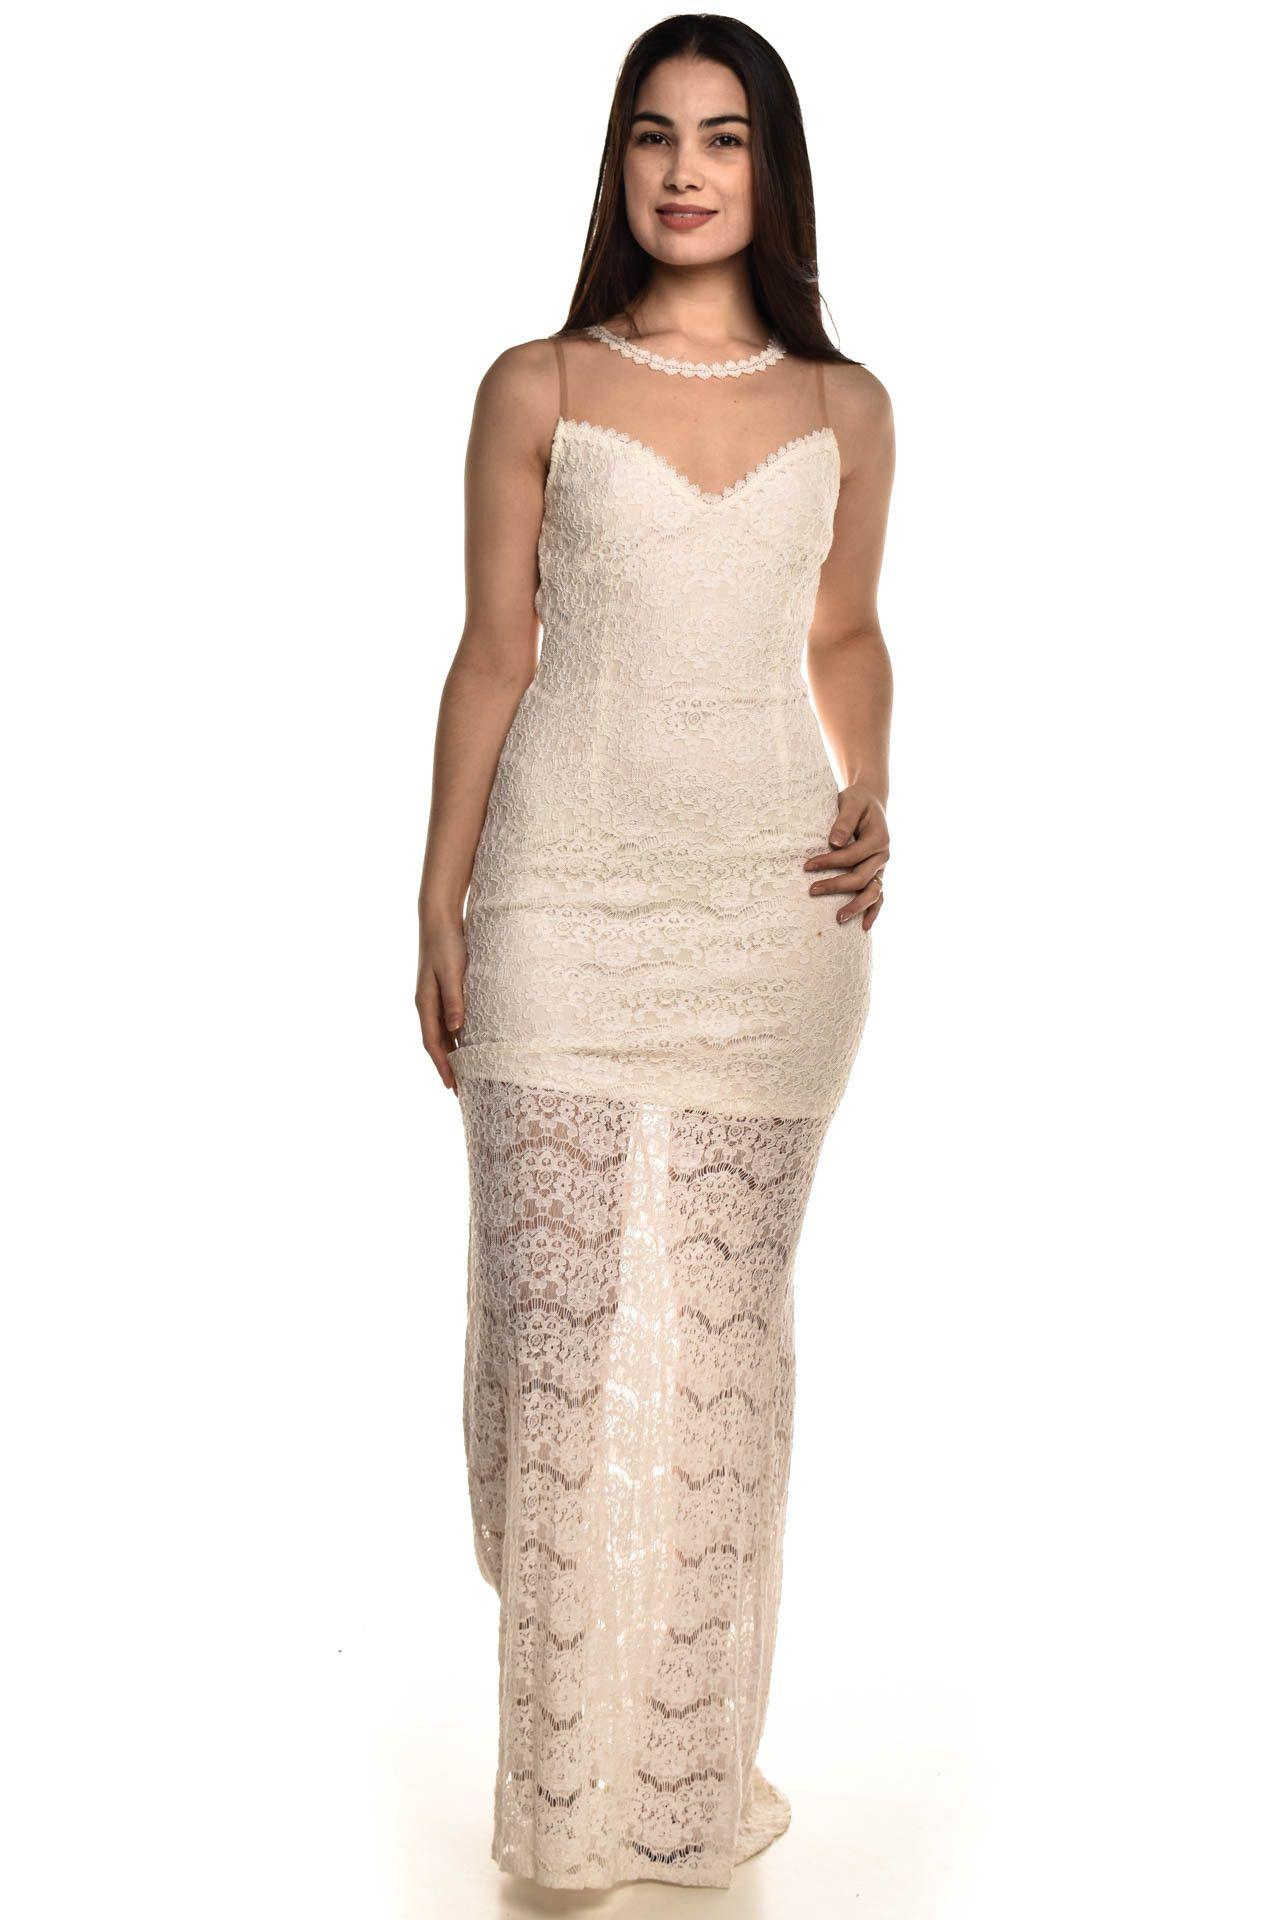 Cheroy - Vestido Longo Off White - Foto 1